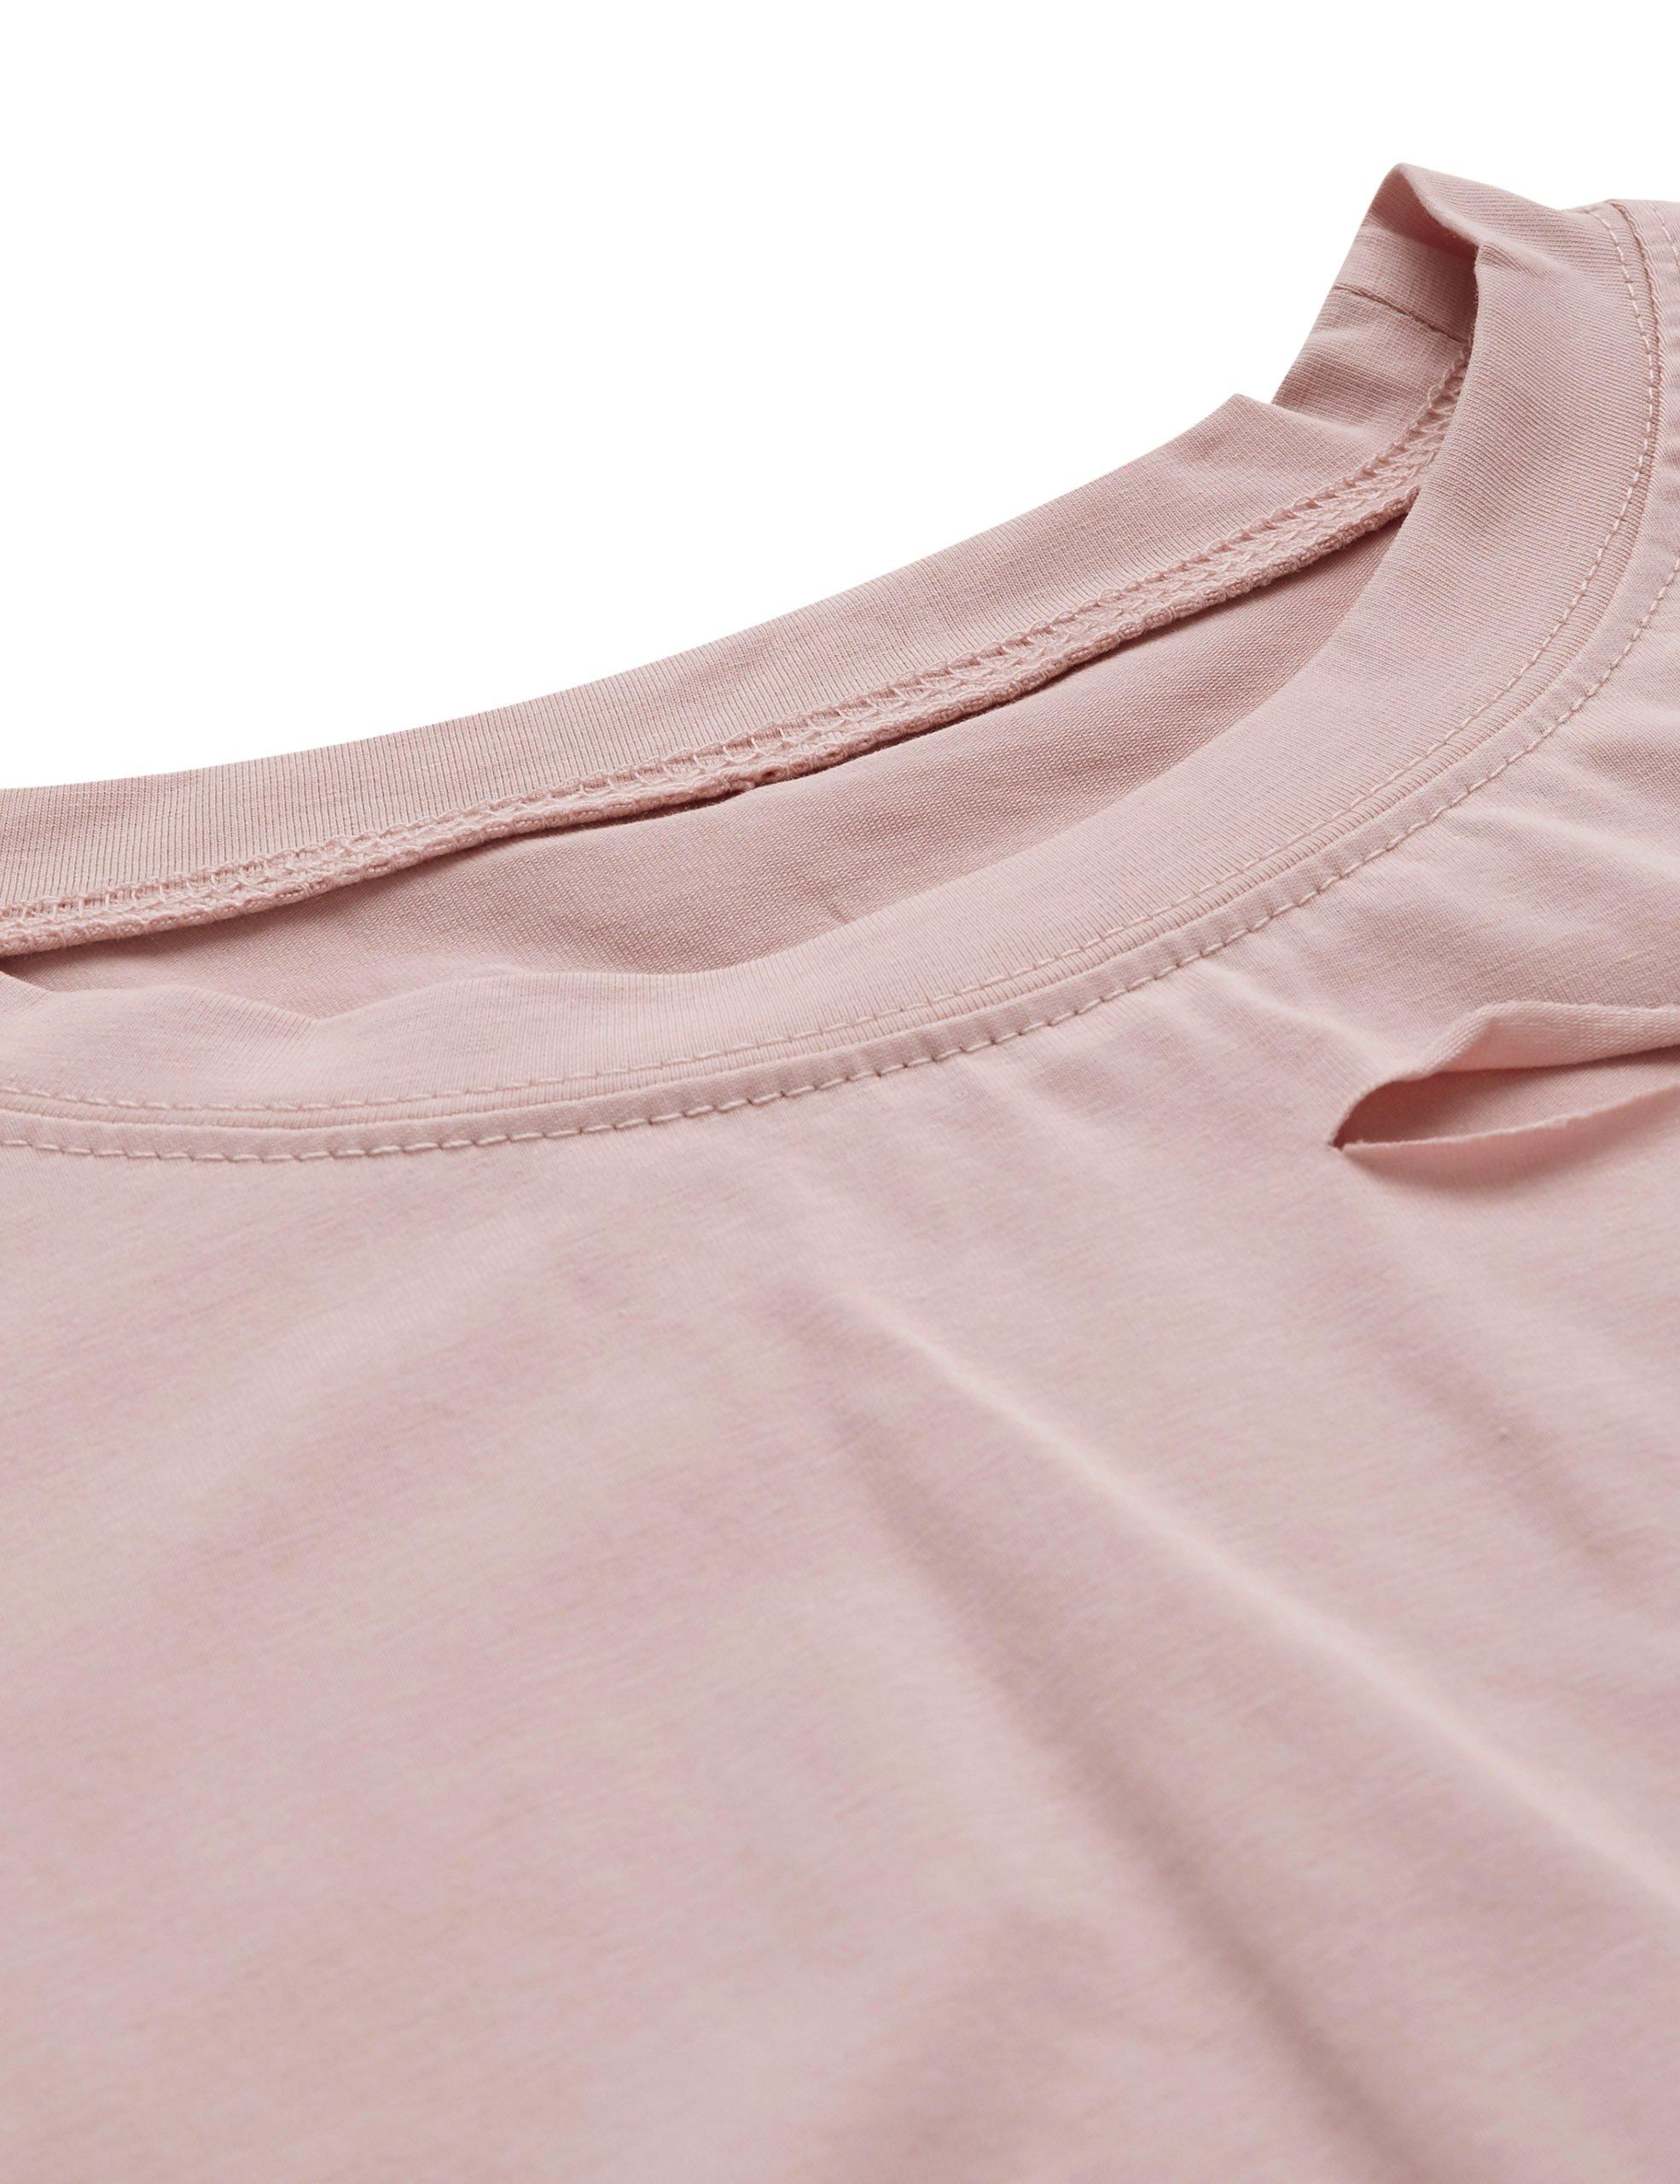 7928ff4612d1c SweatyRocks Women s Summer Short Sleeve Tee Distressed Ripped Crop T-shirt  Tops (Medium